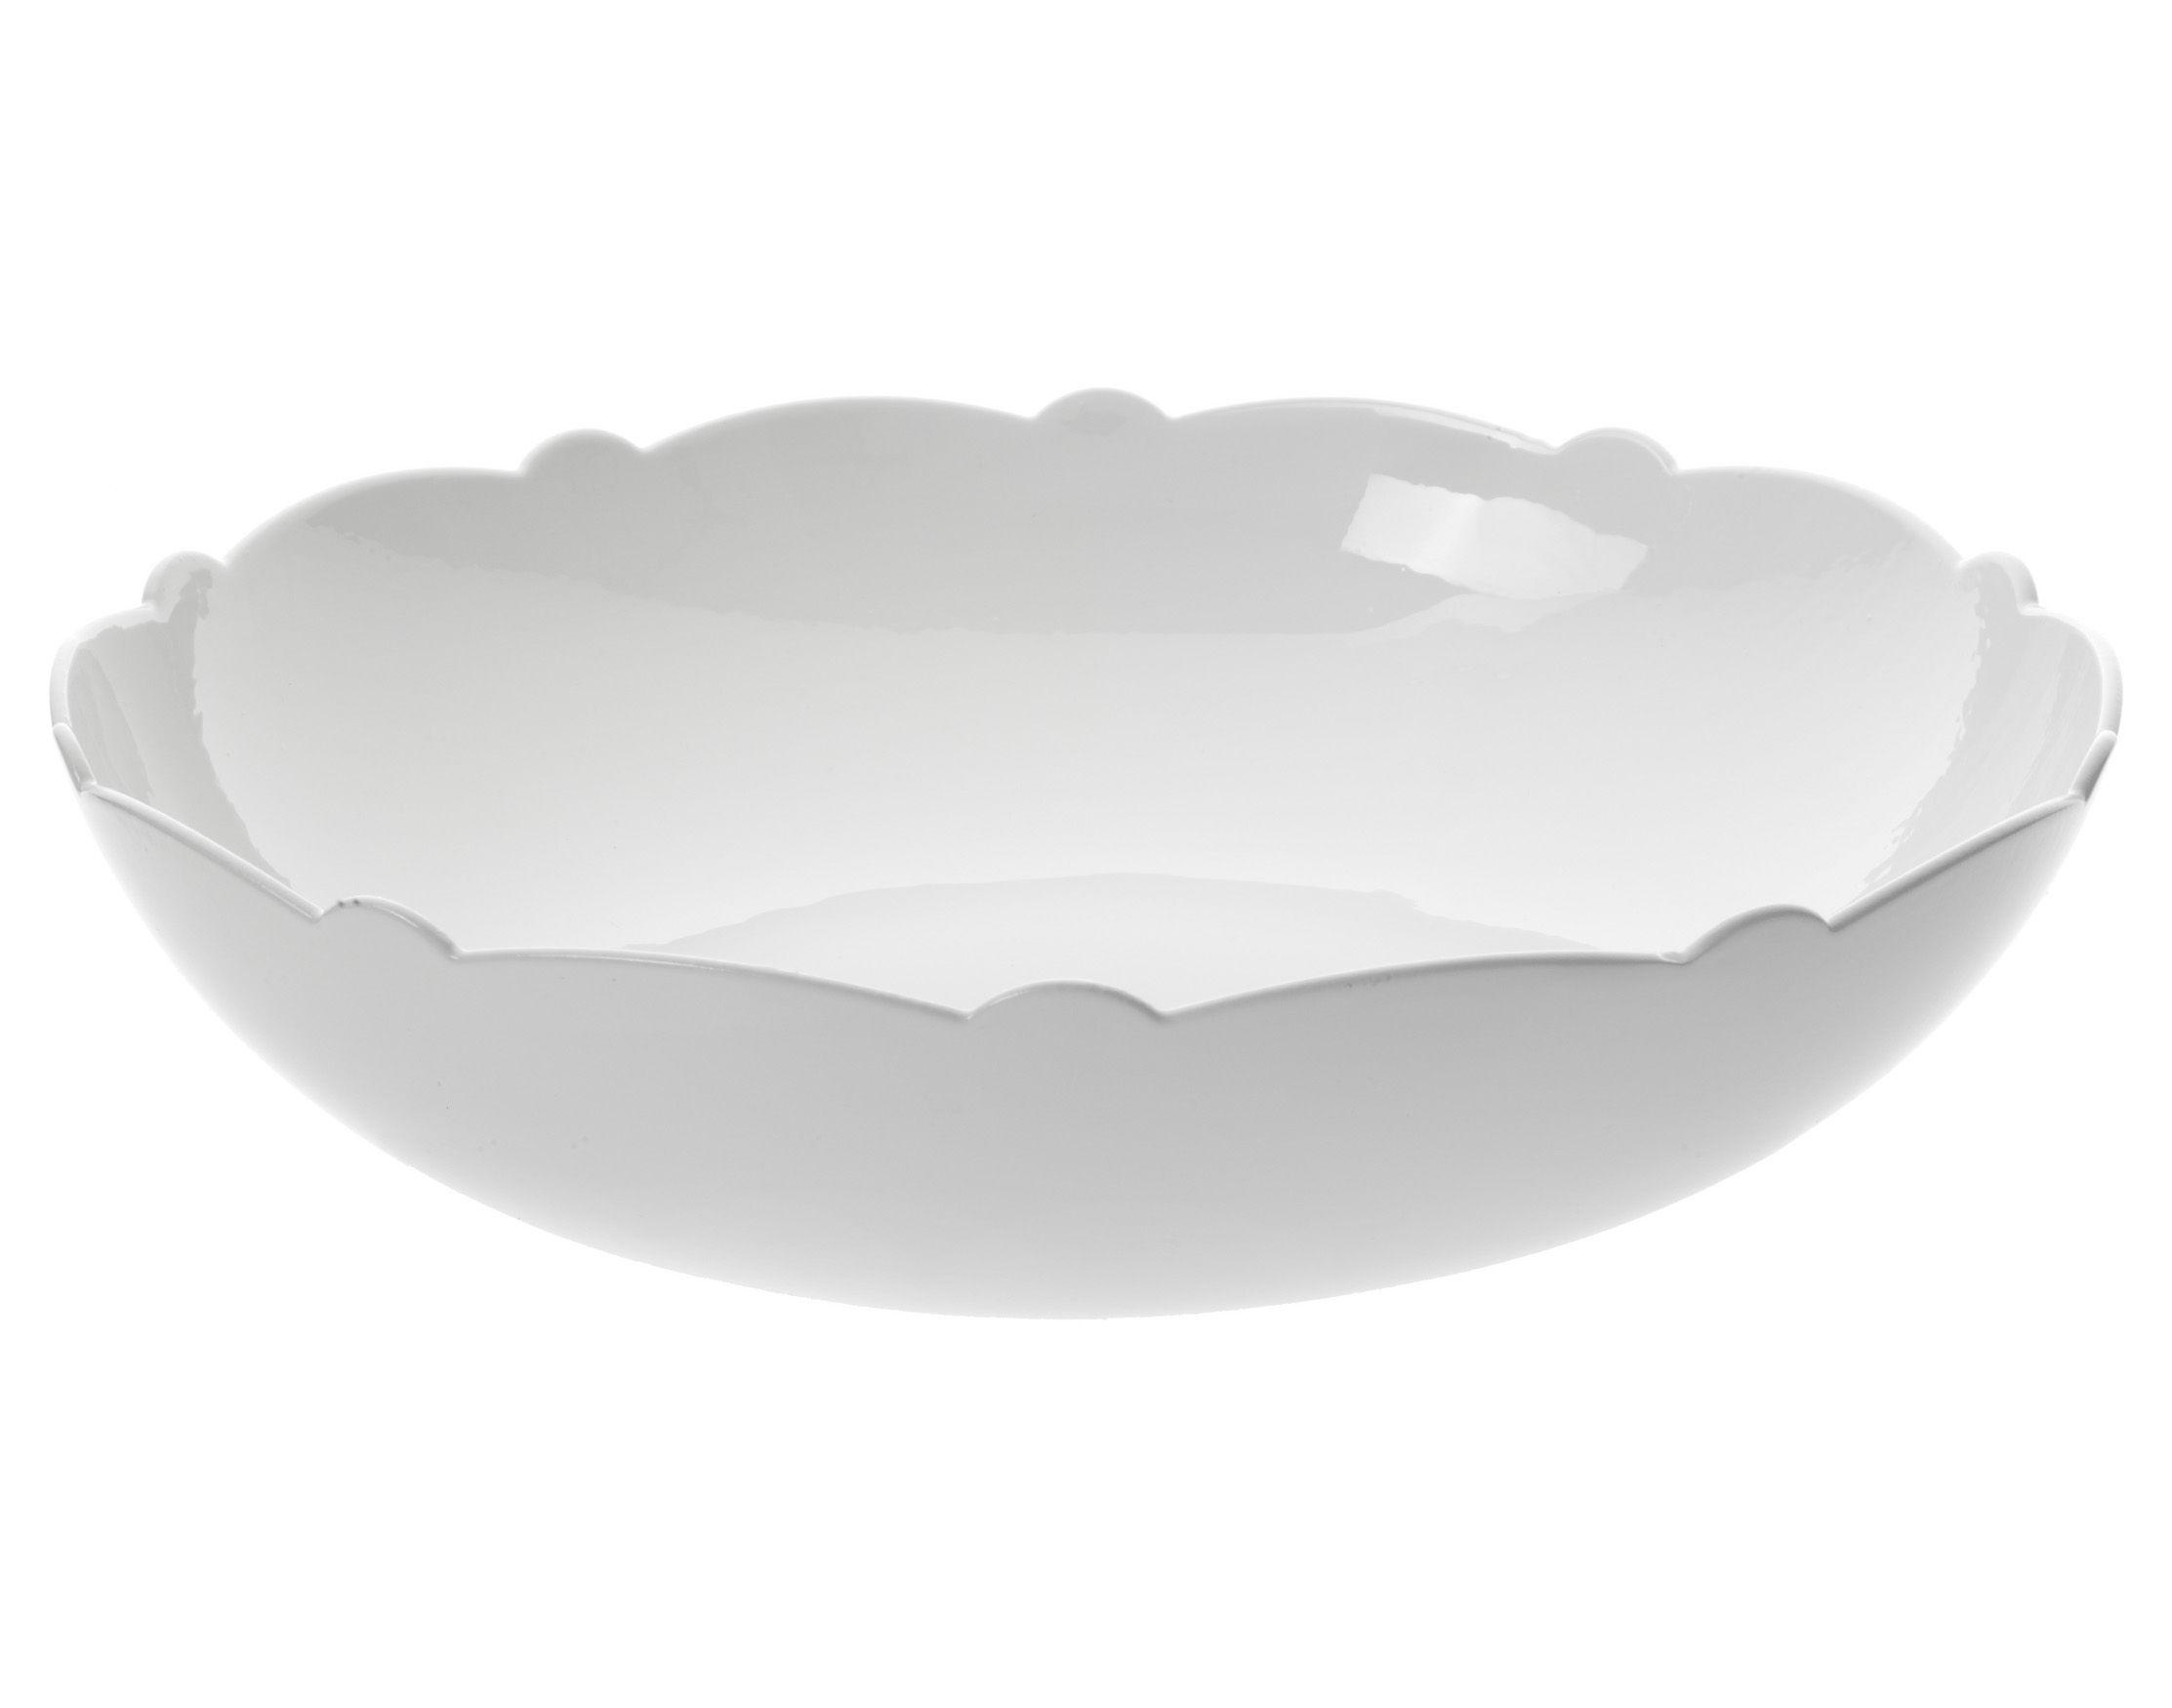 Tavola - Ciotole - Insalatiera Dressed - Ø 29 cm di Alessi - Insalatiera Ø 29 cm - Bianco - Porcellana